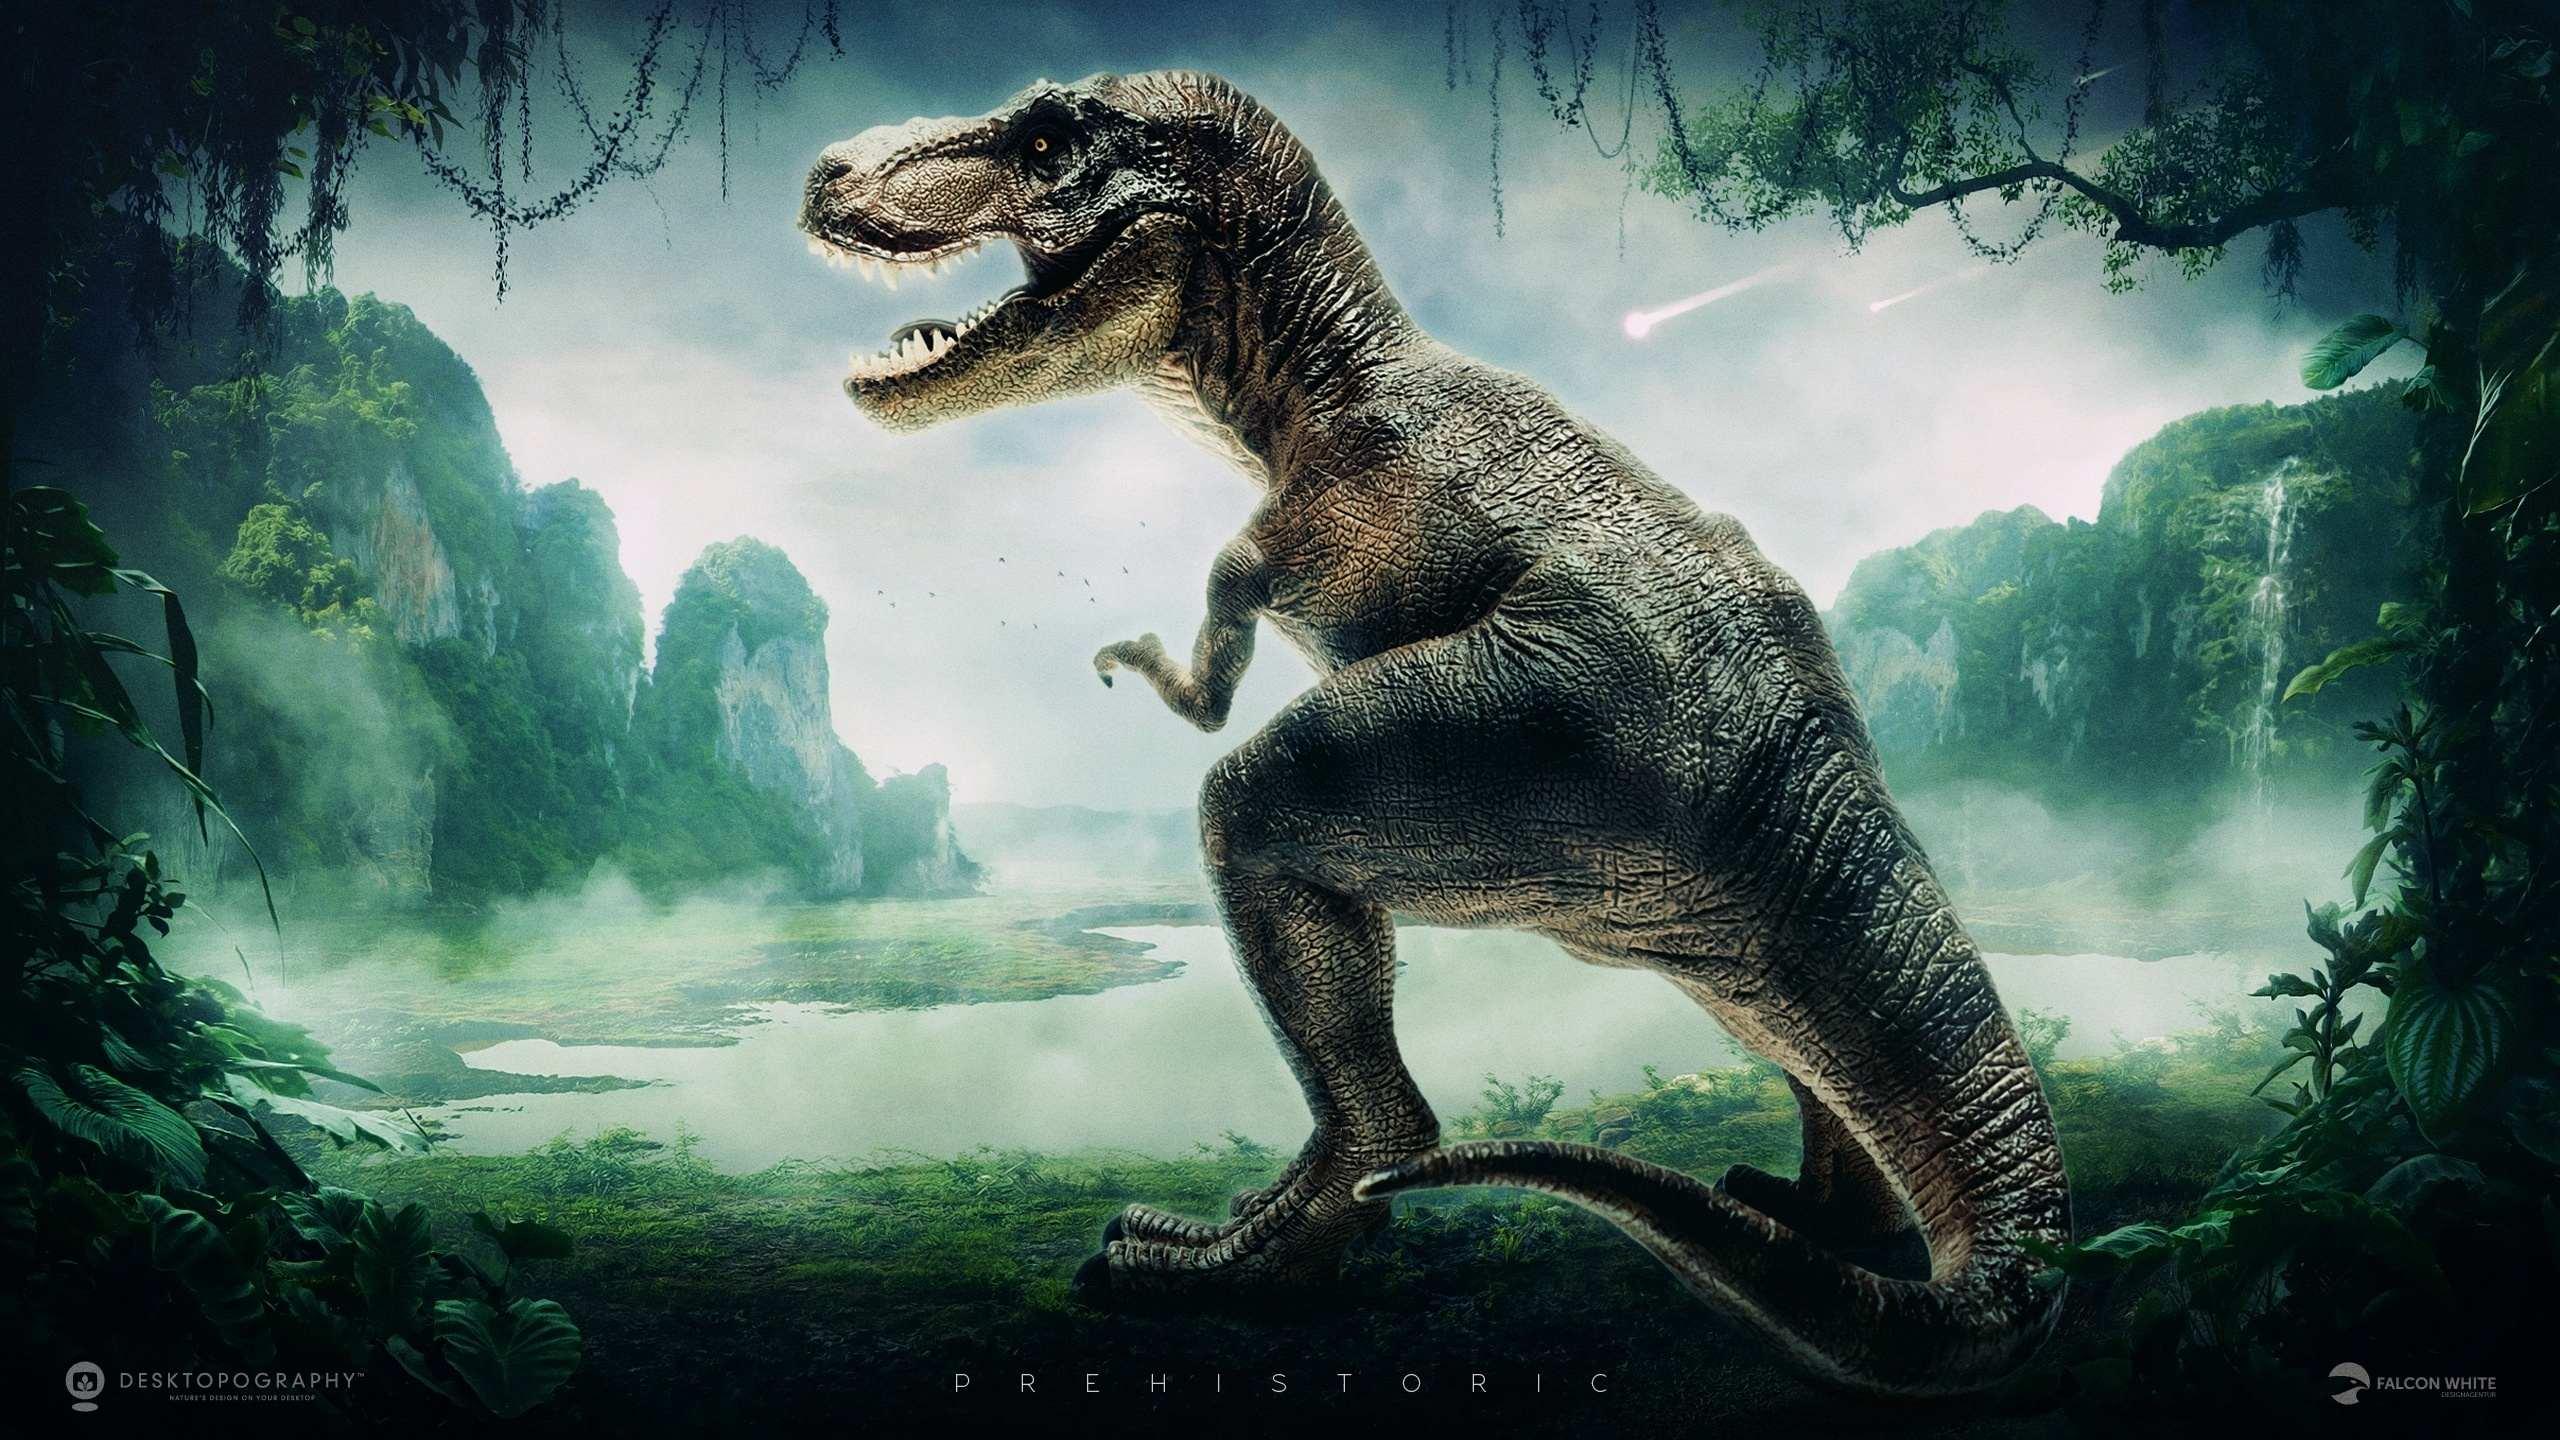 T Rex Dinosaur Wallpaper and Tyrannosaurus Rex Wallpapers 2560x1440